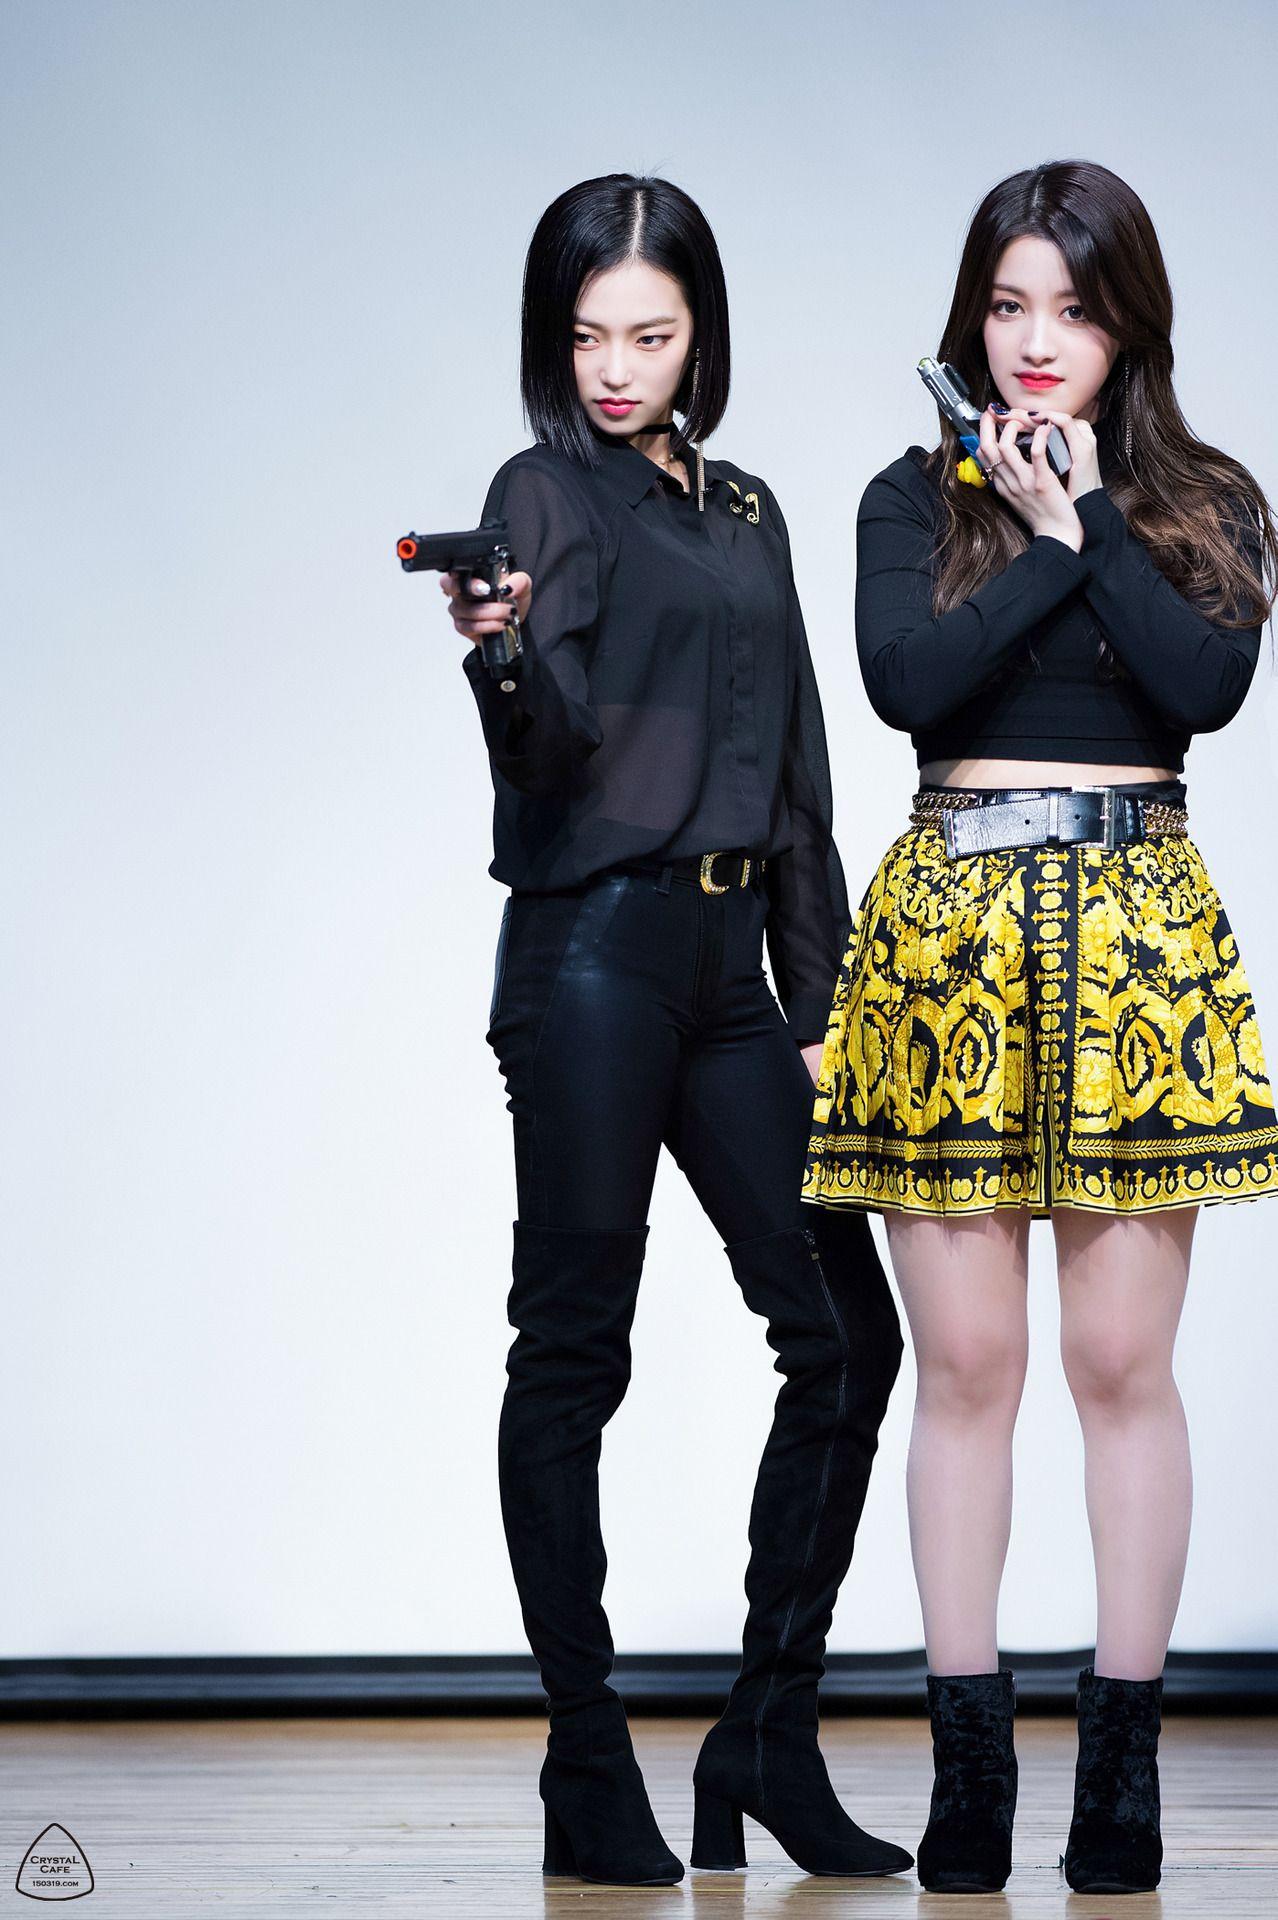 Dedicated To Female Kpop Idols Kpop Outfits Female Clc